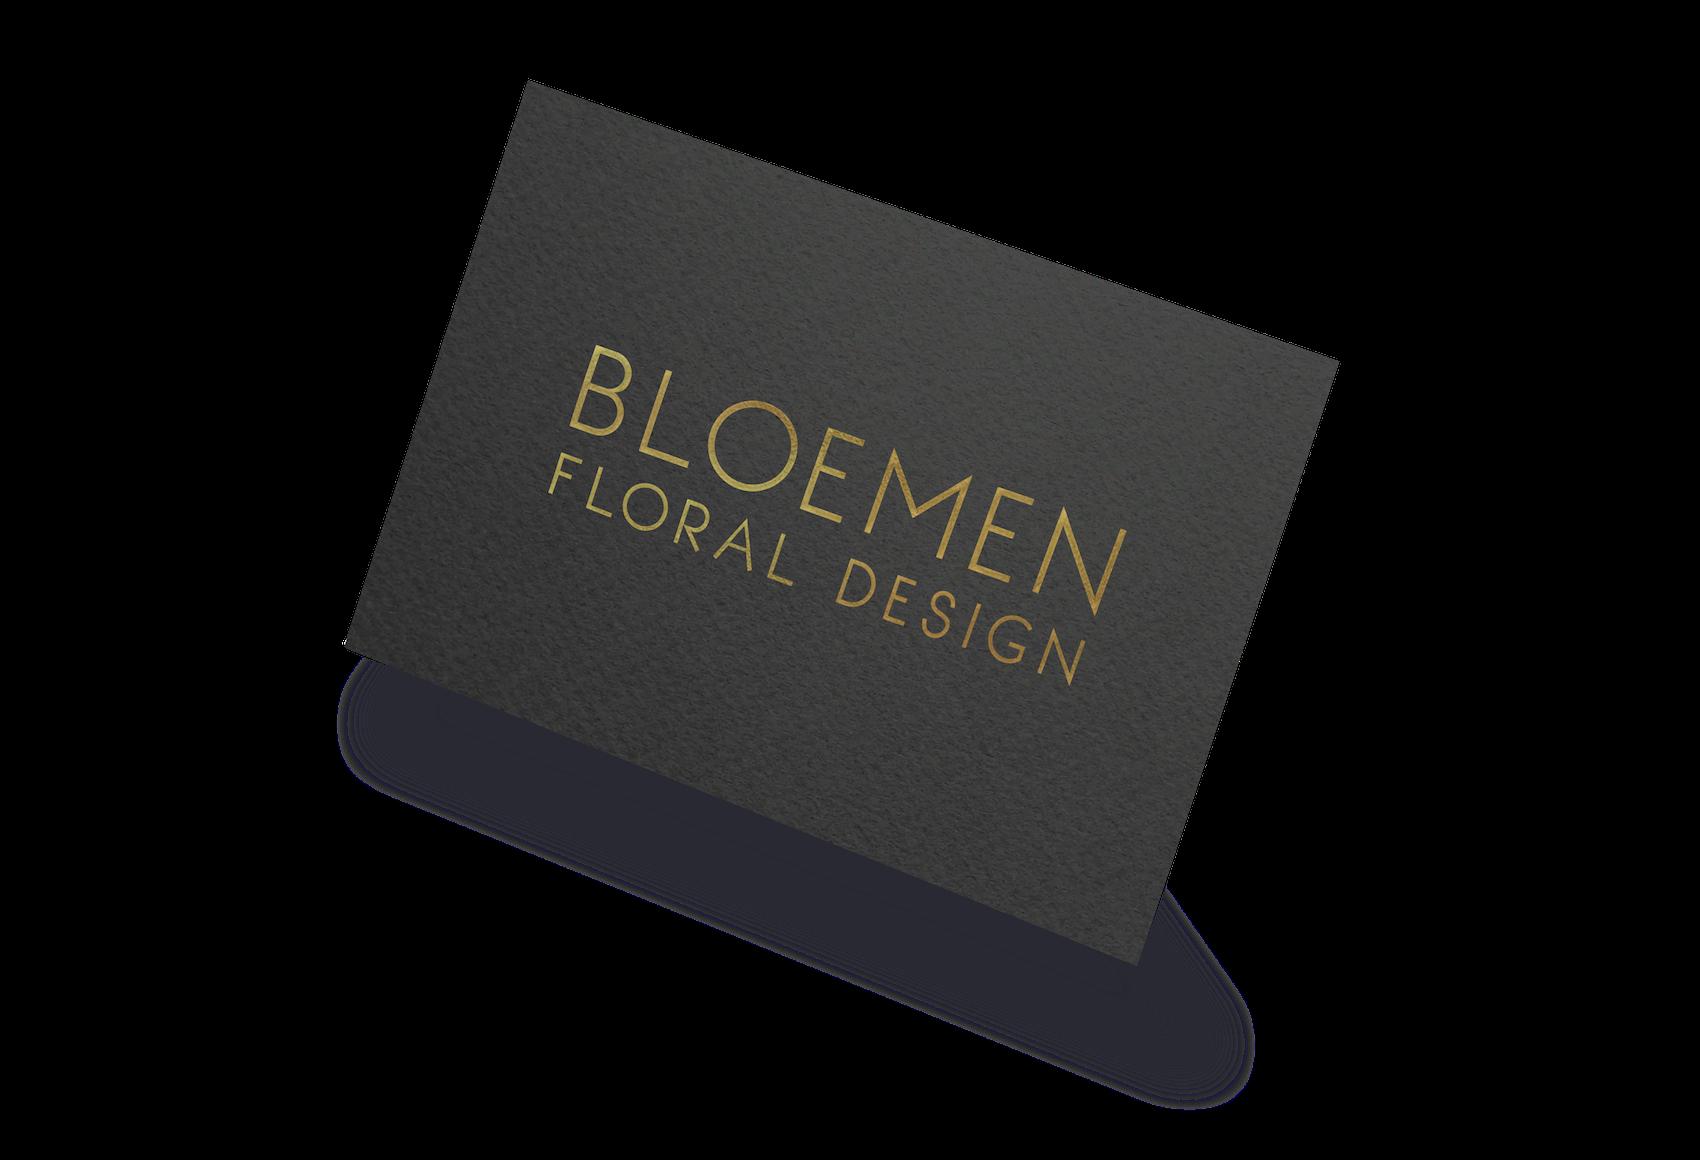 laura-vidal-design-business-cards.png